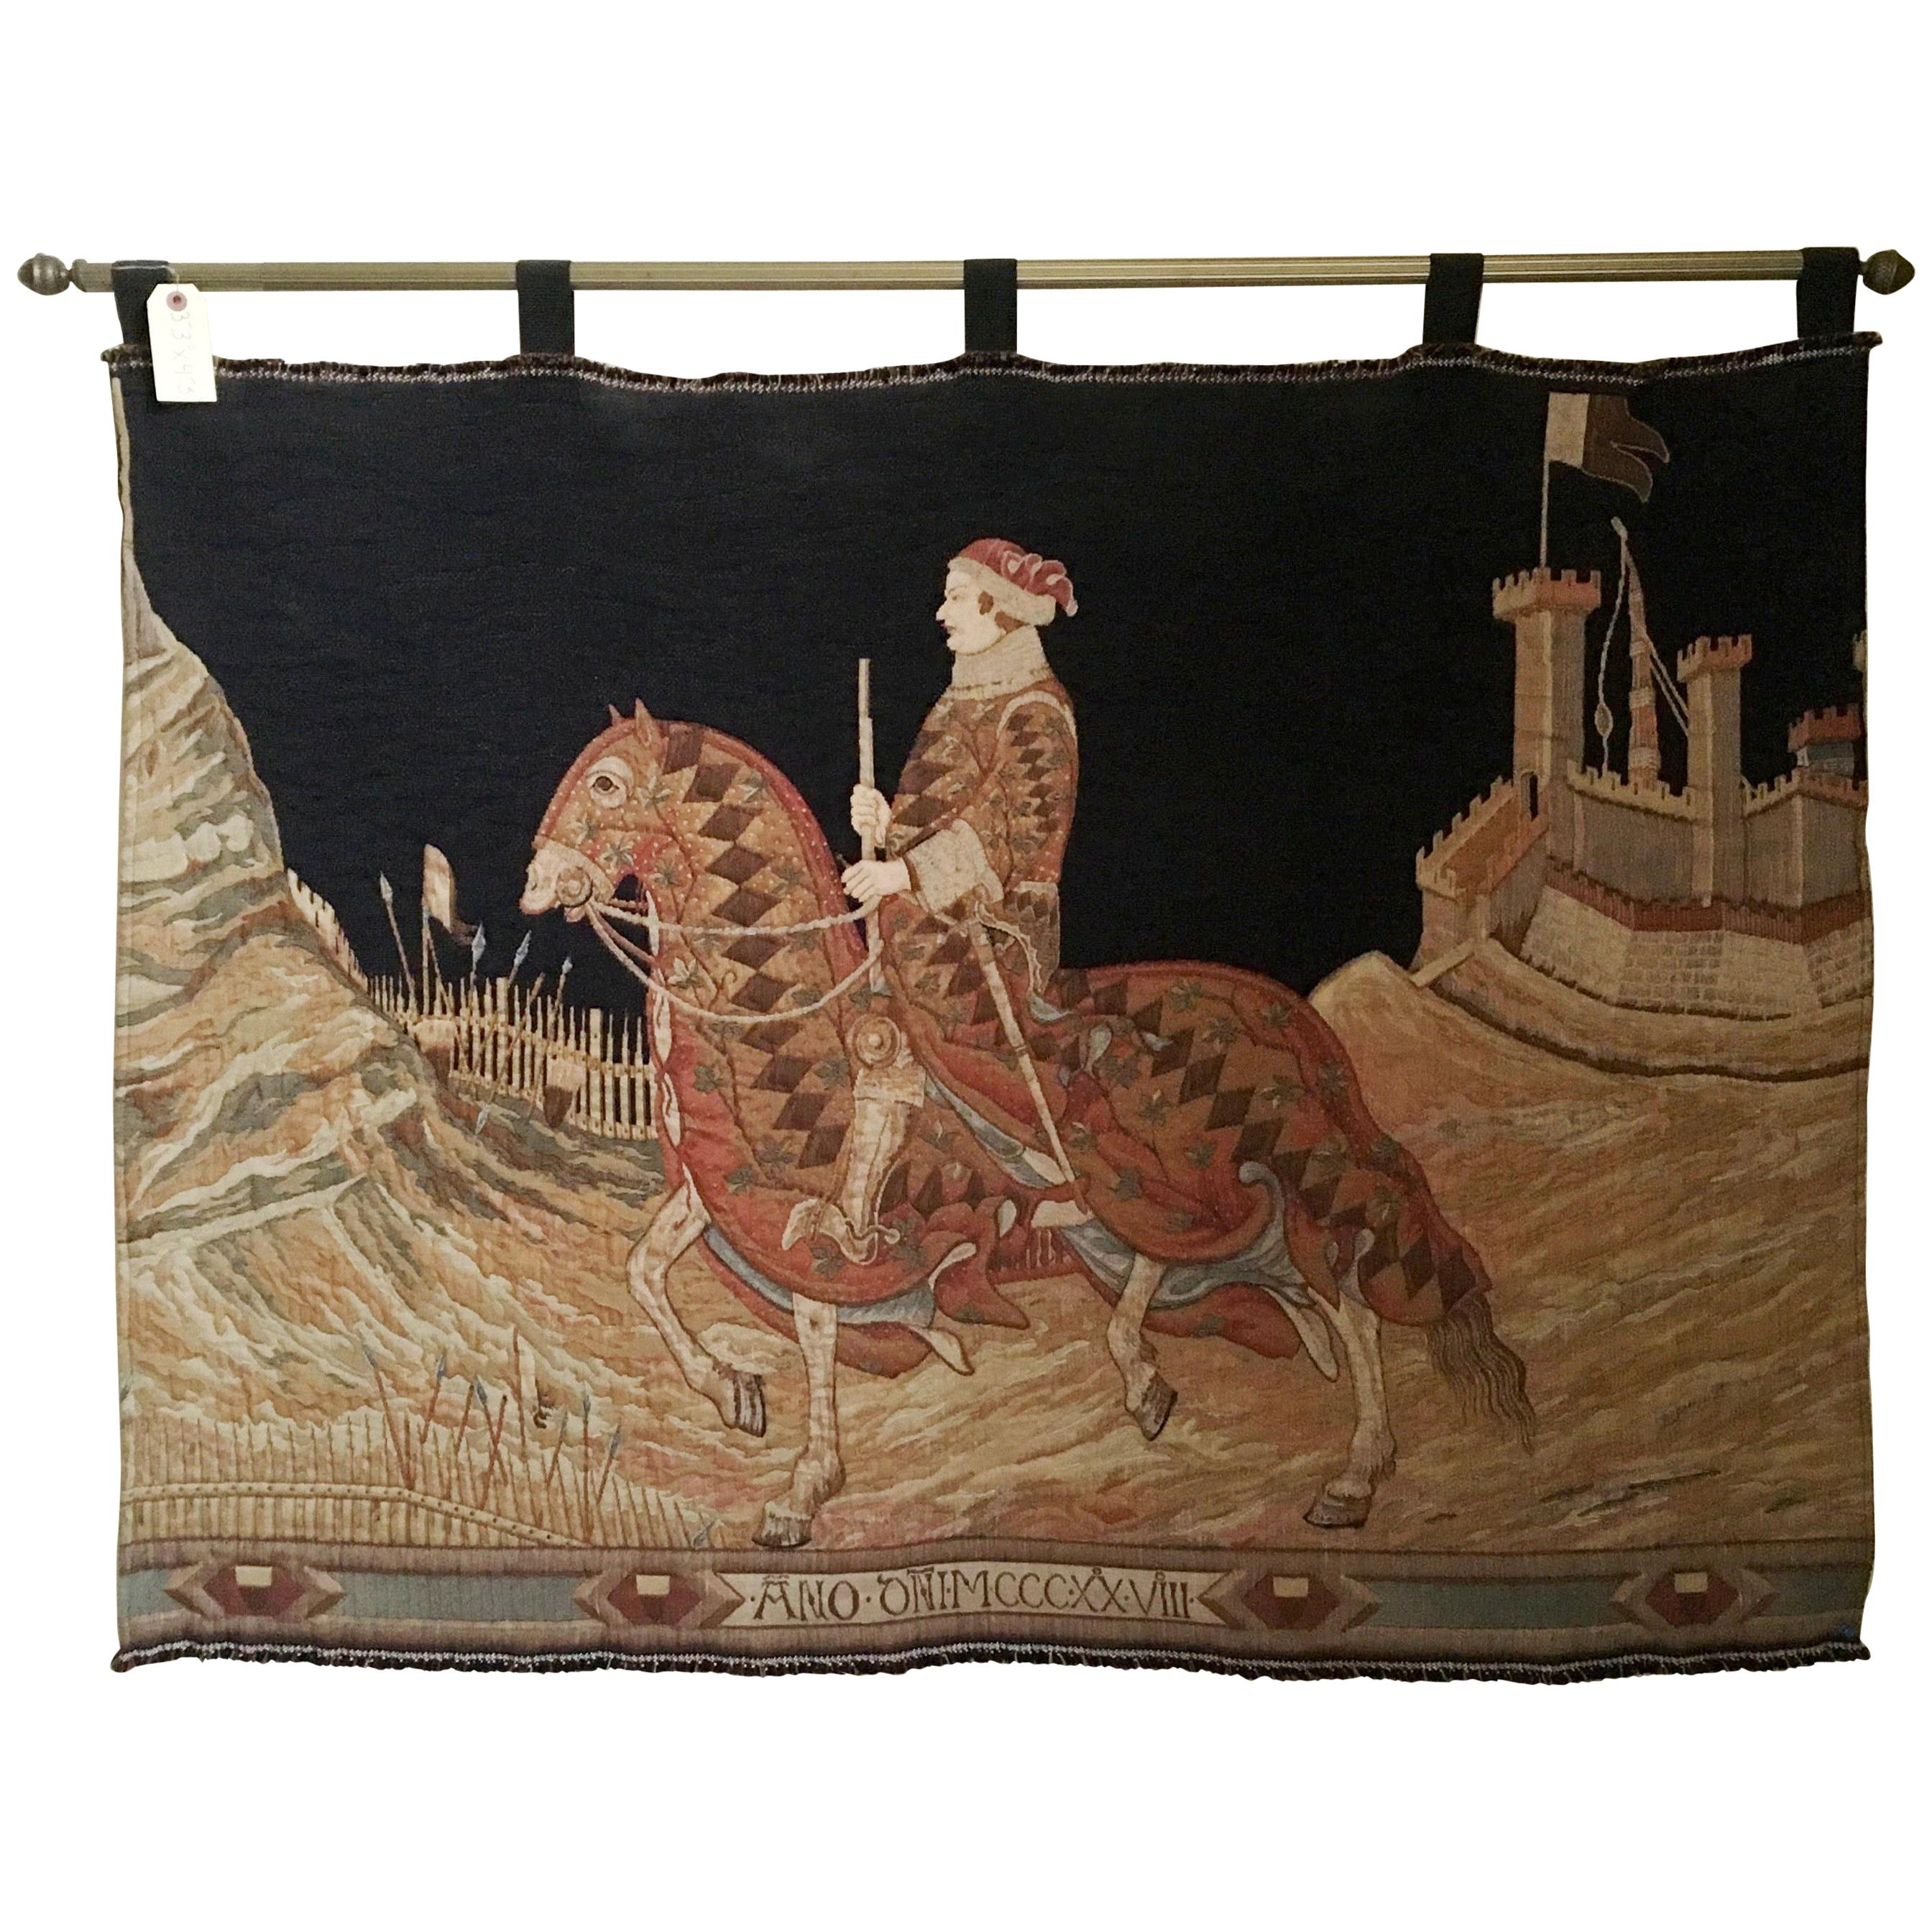 Italian Woven Tapestry of Rider